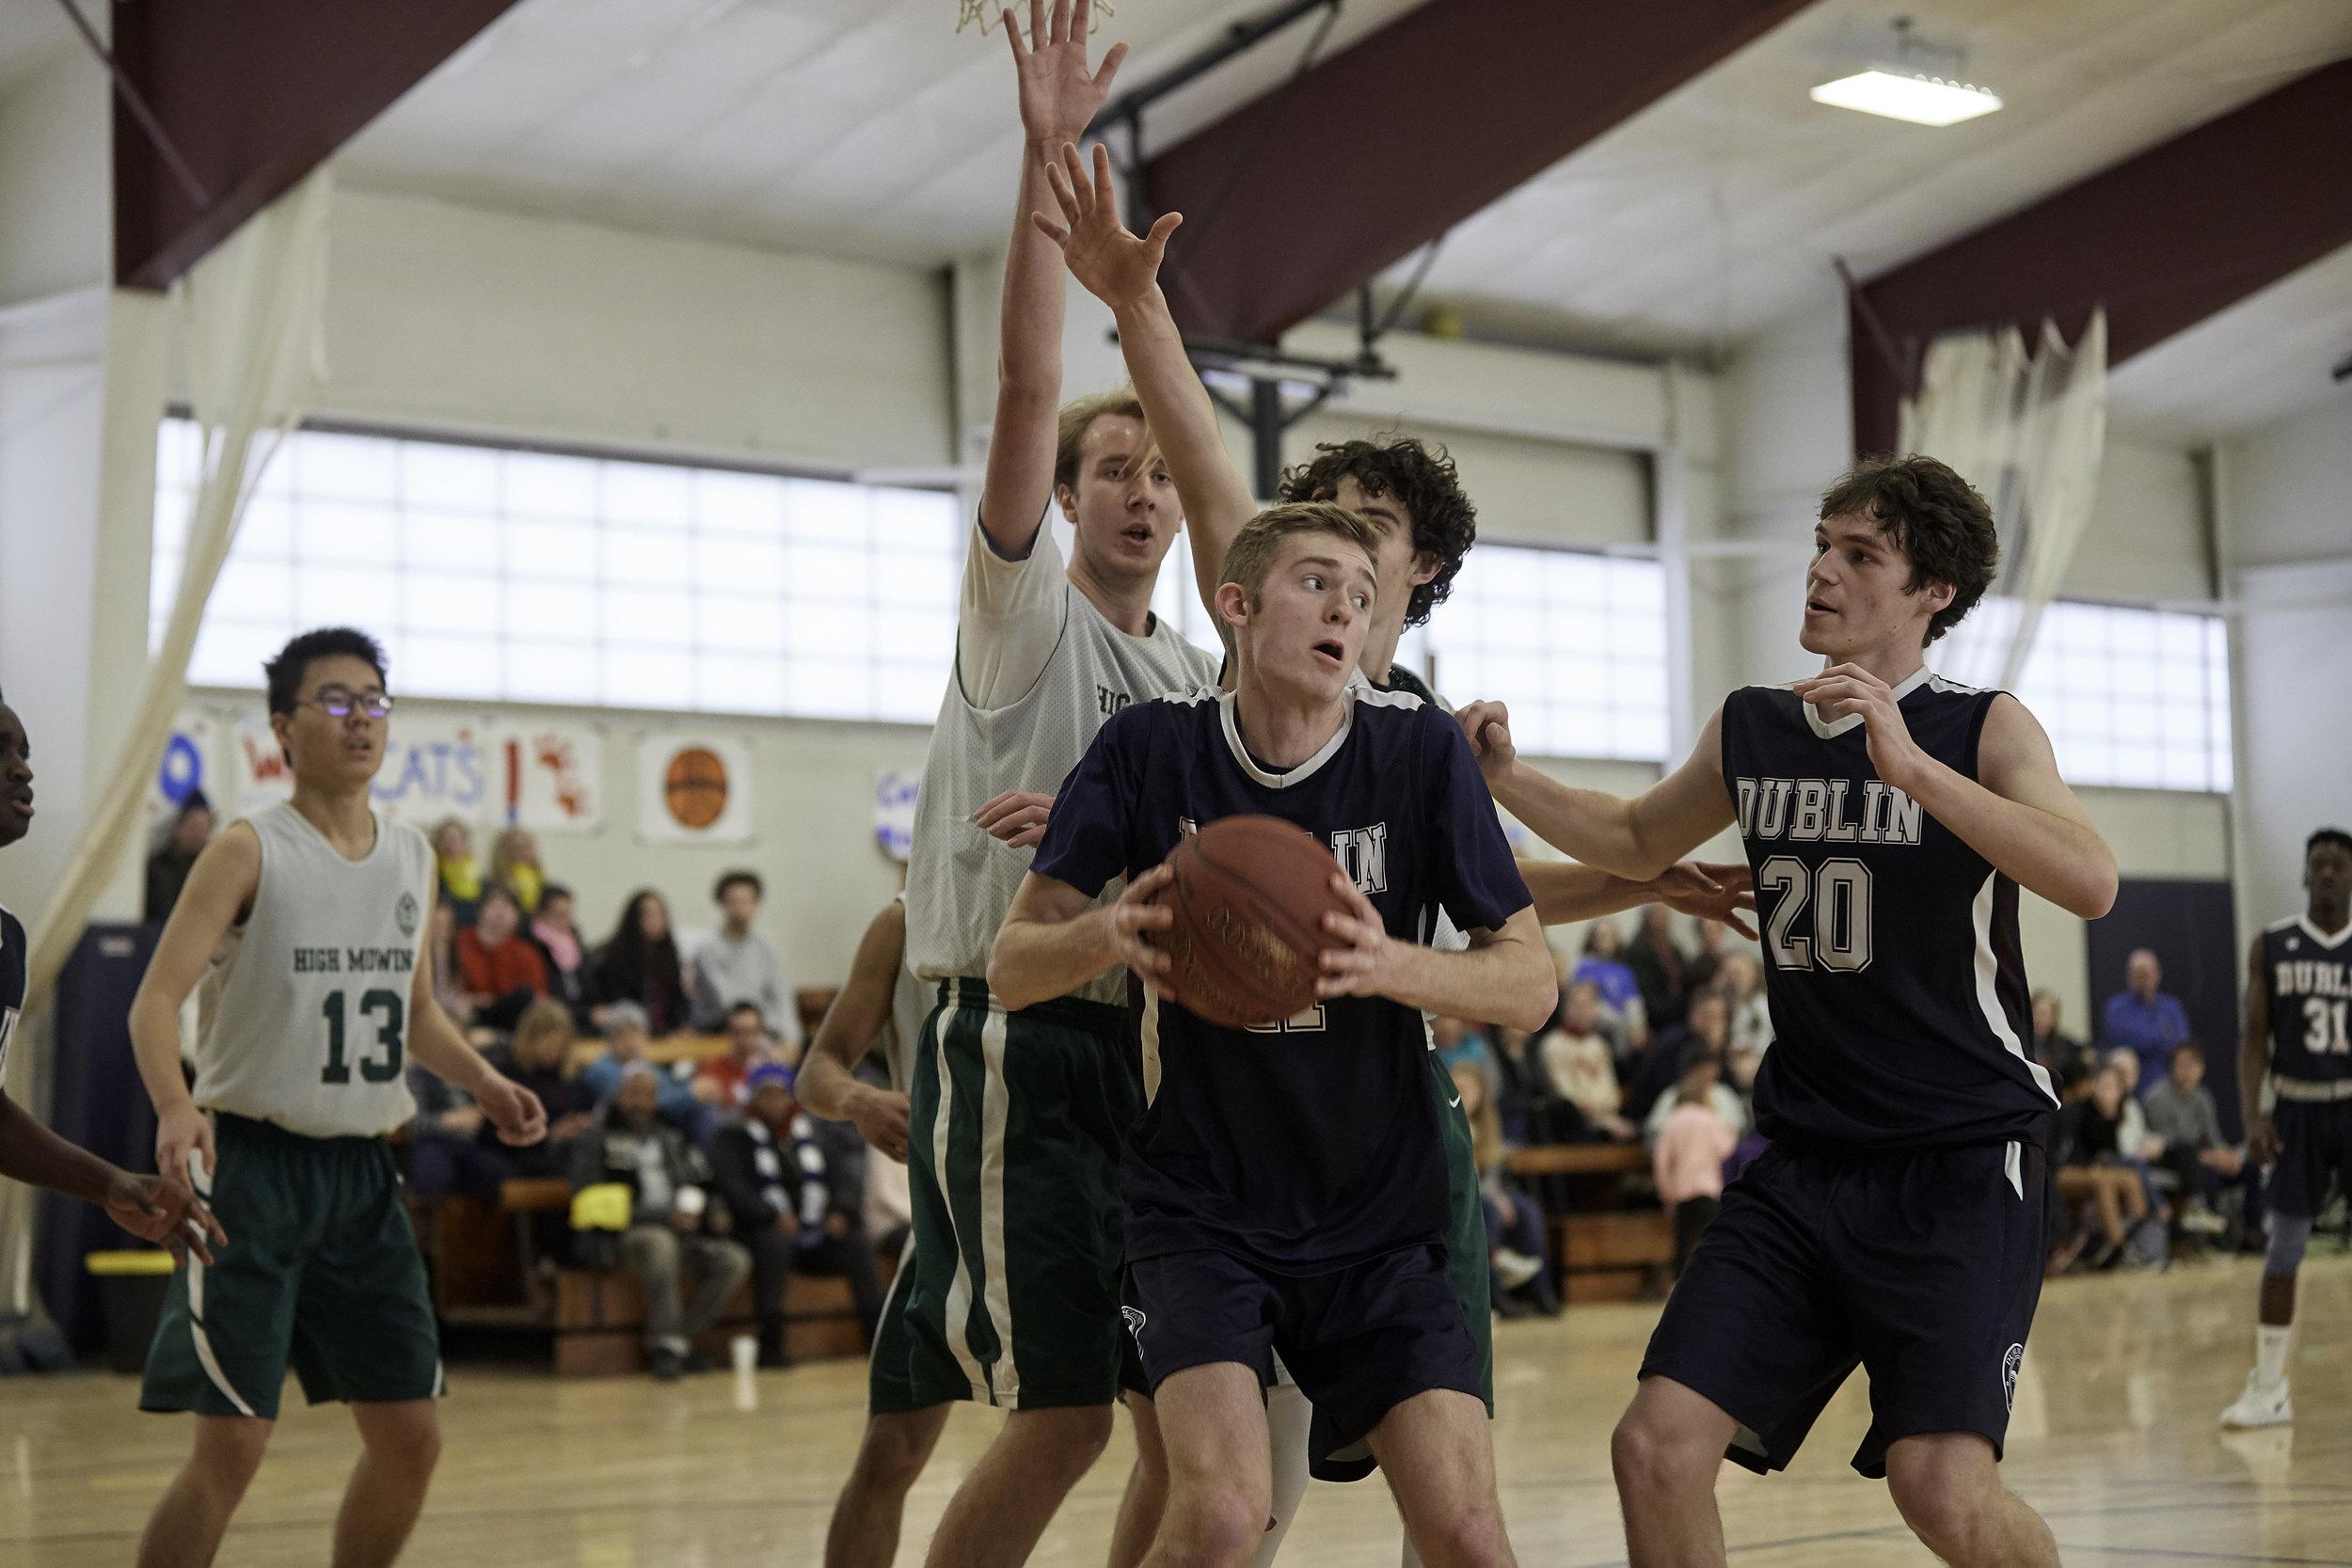 Boys Varsity Basketball vs High Mowing School - Feb 02 2019 - 0077.jpg